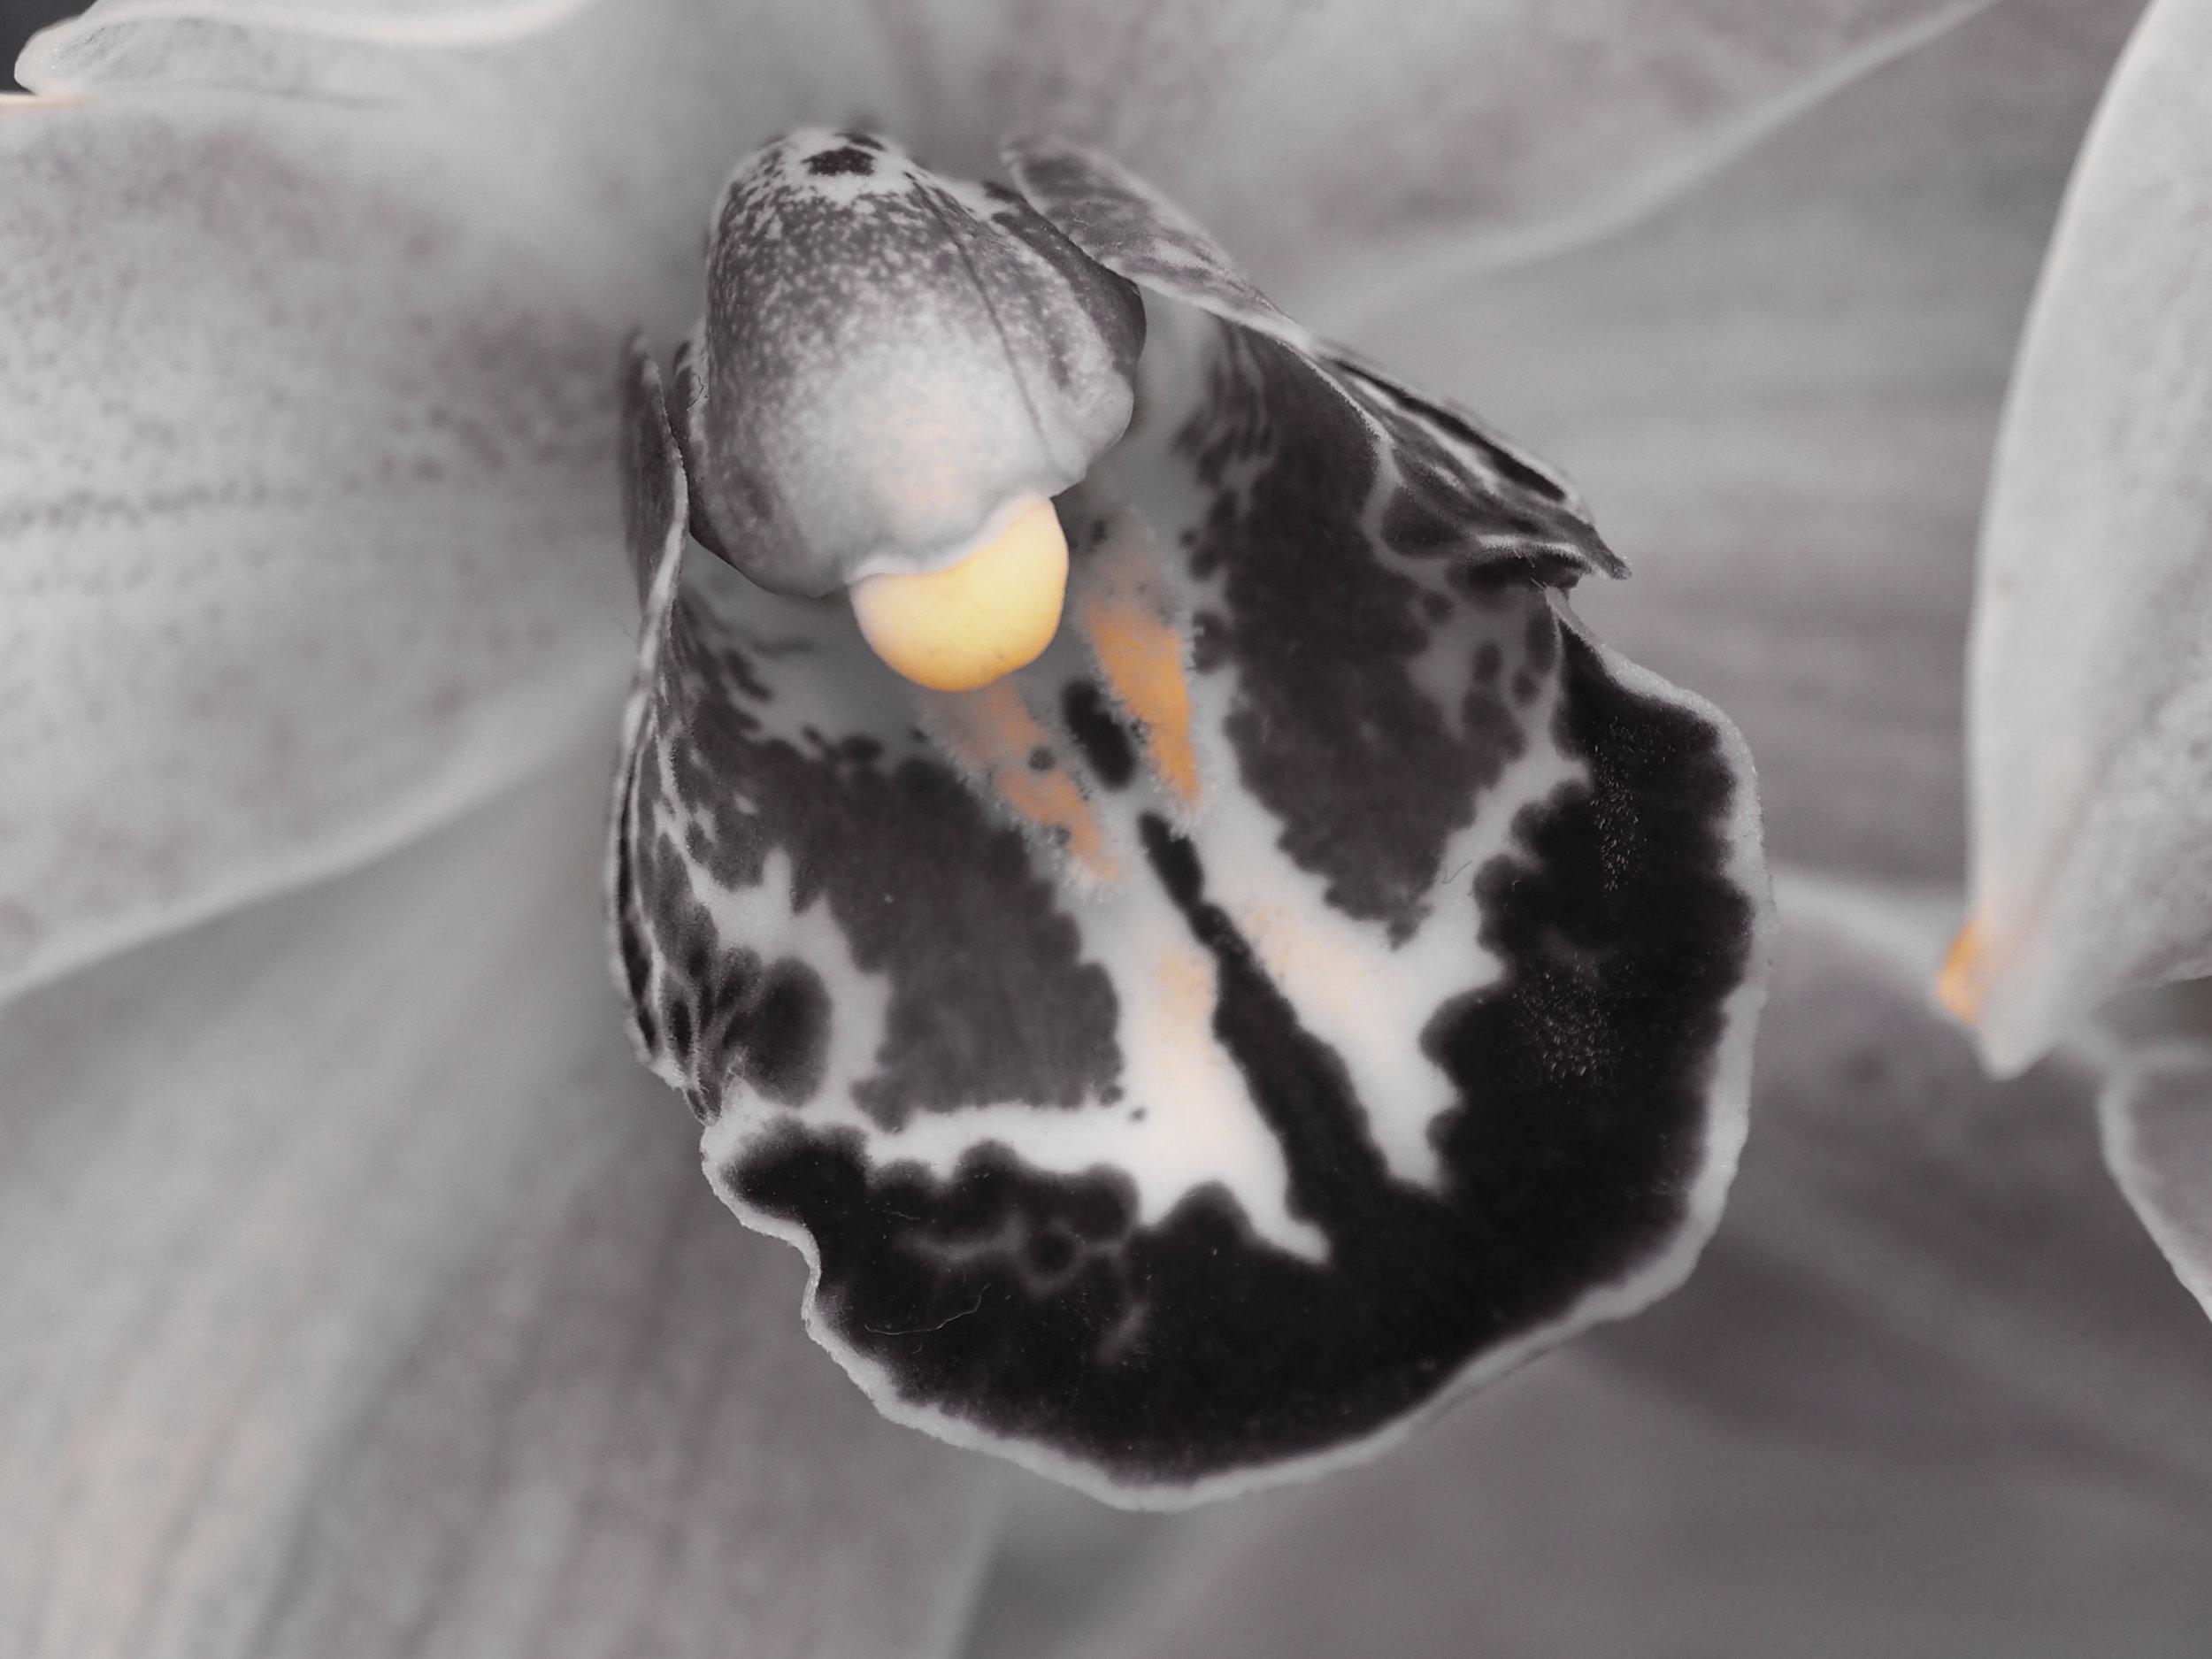 A Bronx Cheer - An Impolite Little Orchid